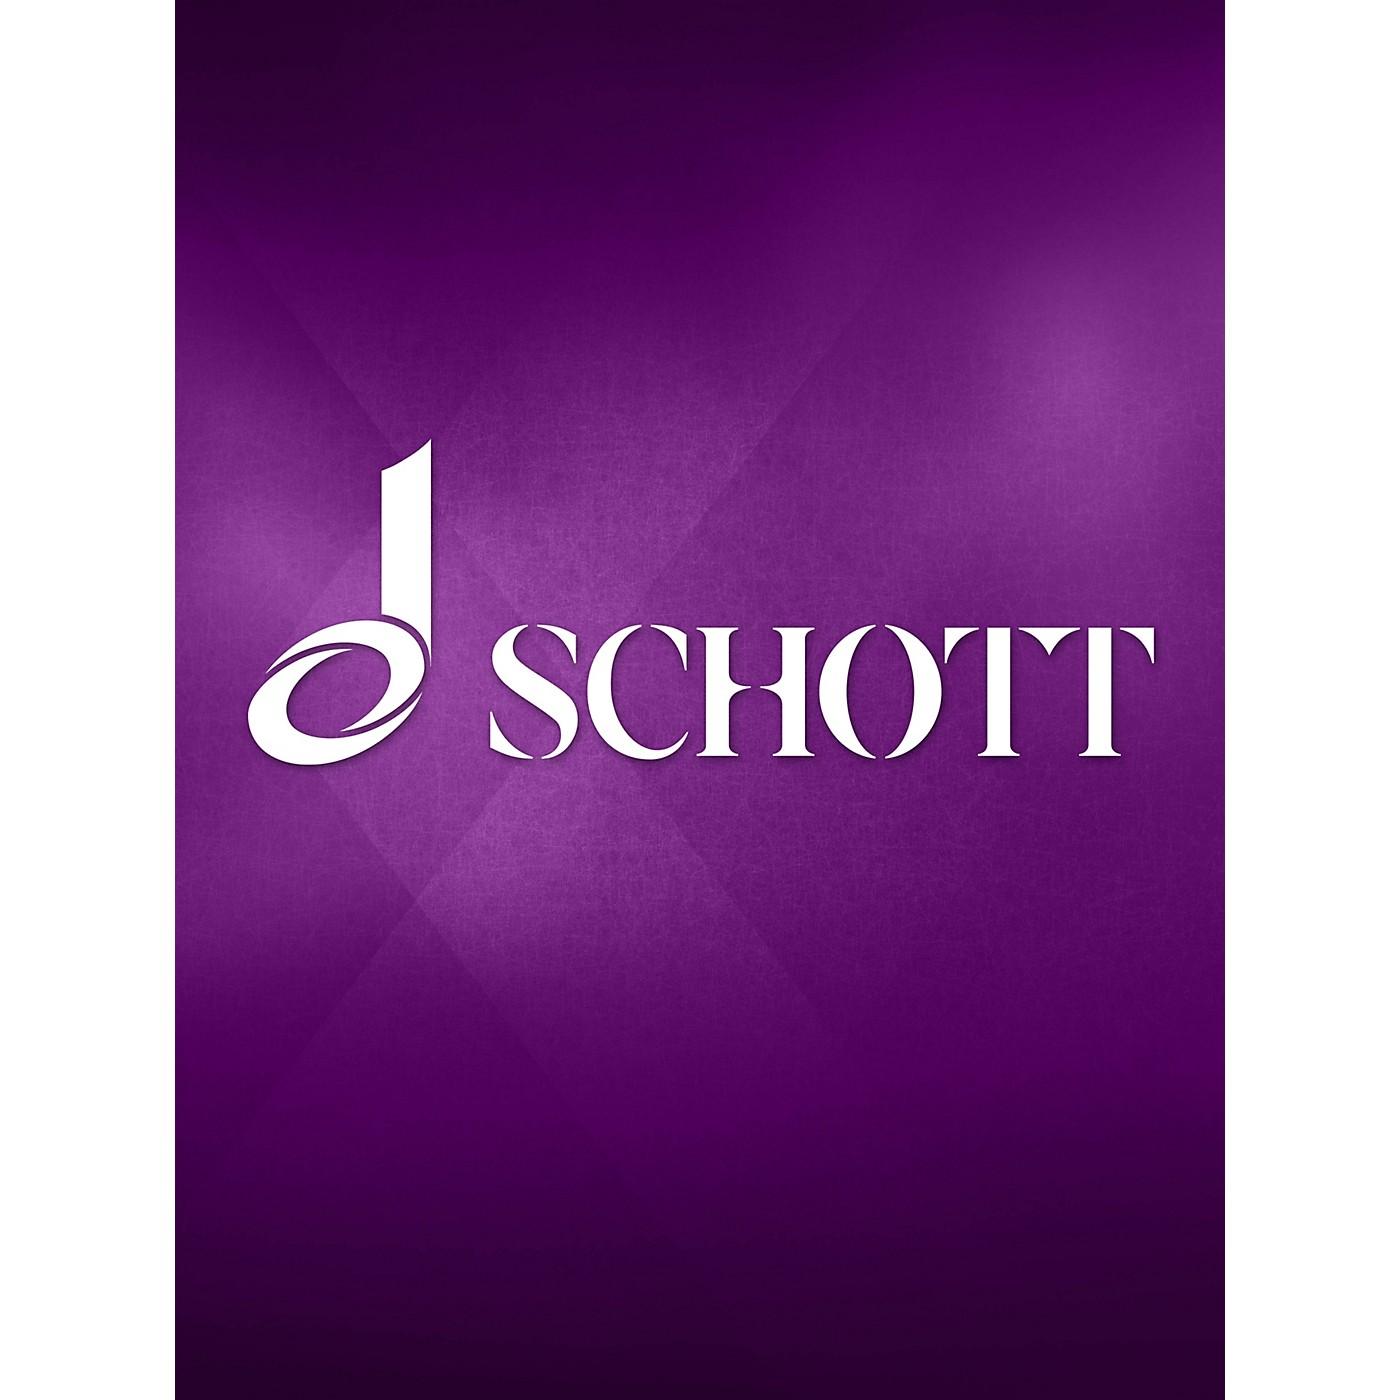 Eulenburg String Quartet No. 2, Op. 44 in E Minor (Study Score) Schott Series Composed by Felix Mendelssohn thumbnail